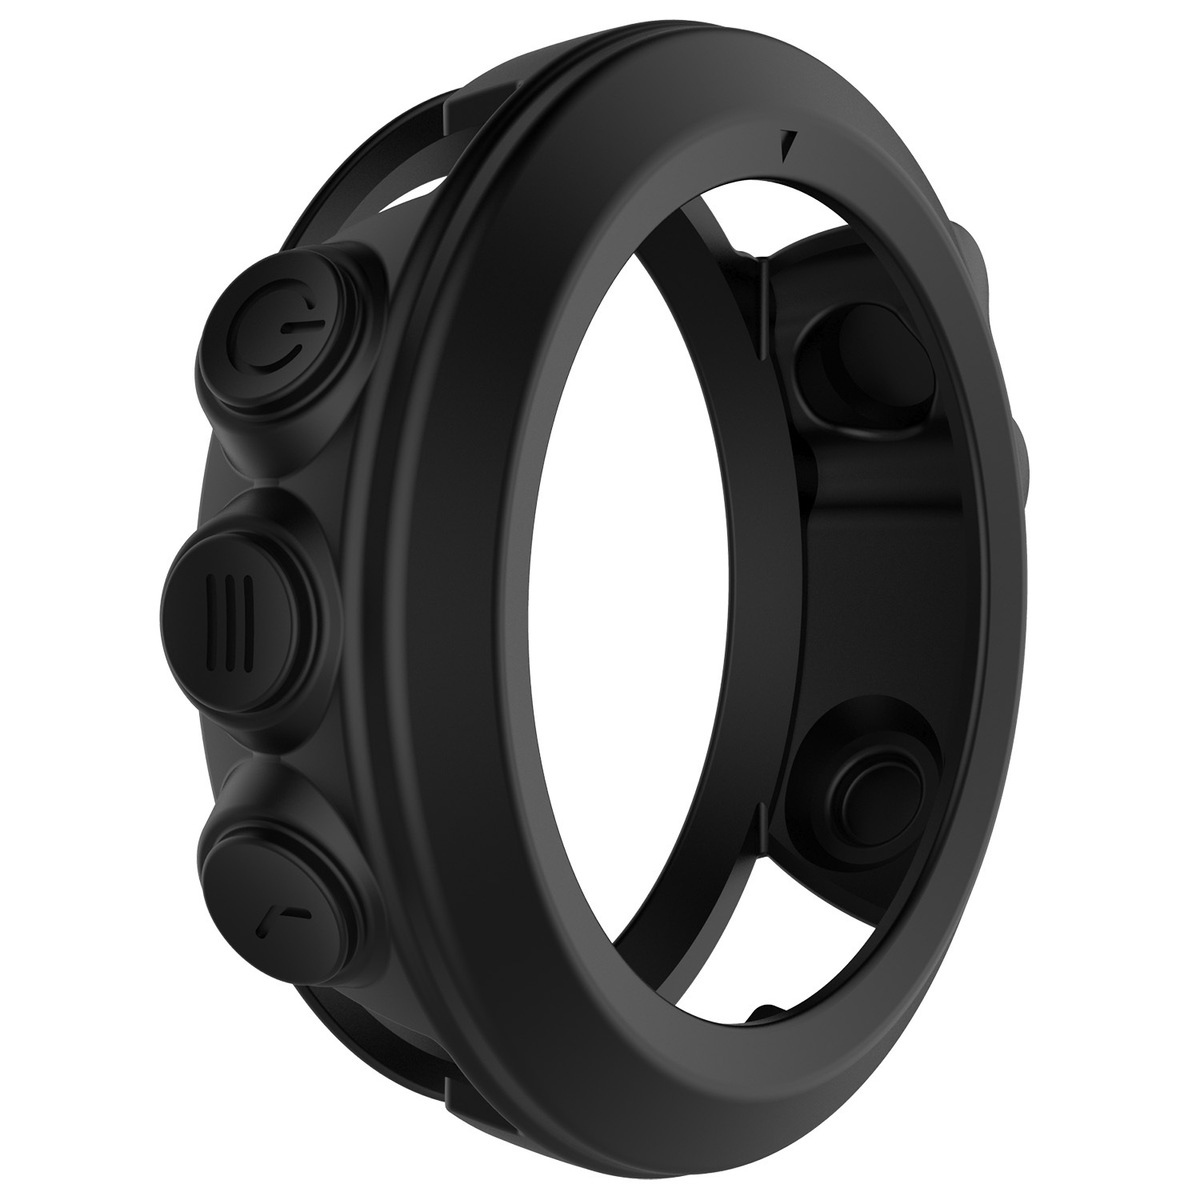 Soft Silicone Protective Case Protector Sleeve for Garmin Fenix 3 HR/Fenix 3/Fenix 3 Sapphire/Quatix 3/Tactix Bravo Band Cover все цены